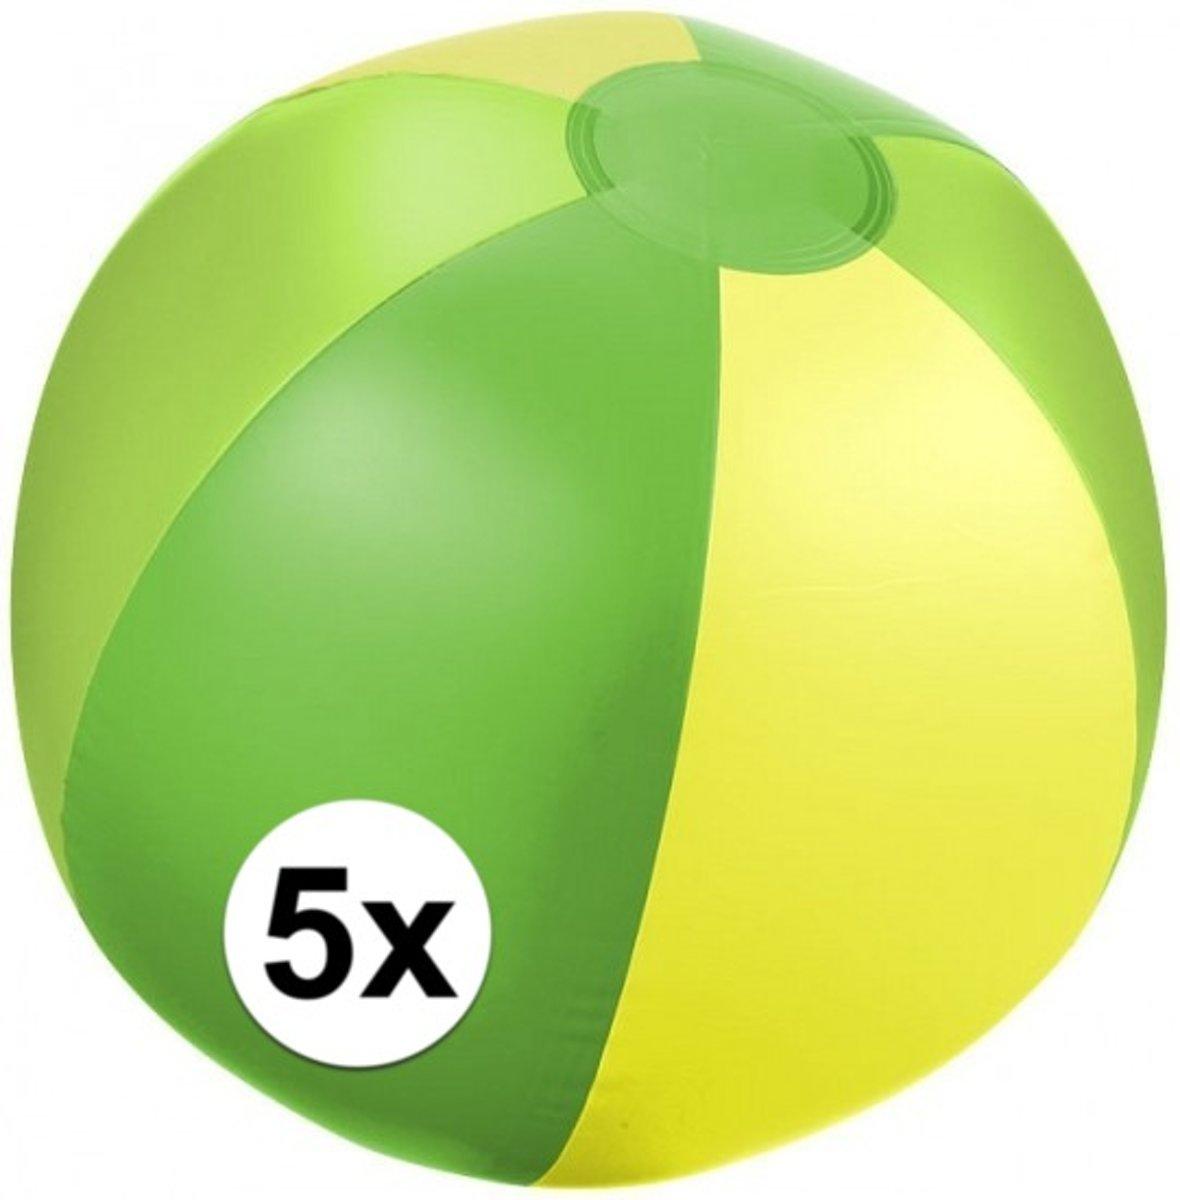 5x Opblaasbare strandbal groen